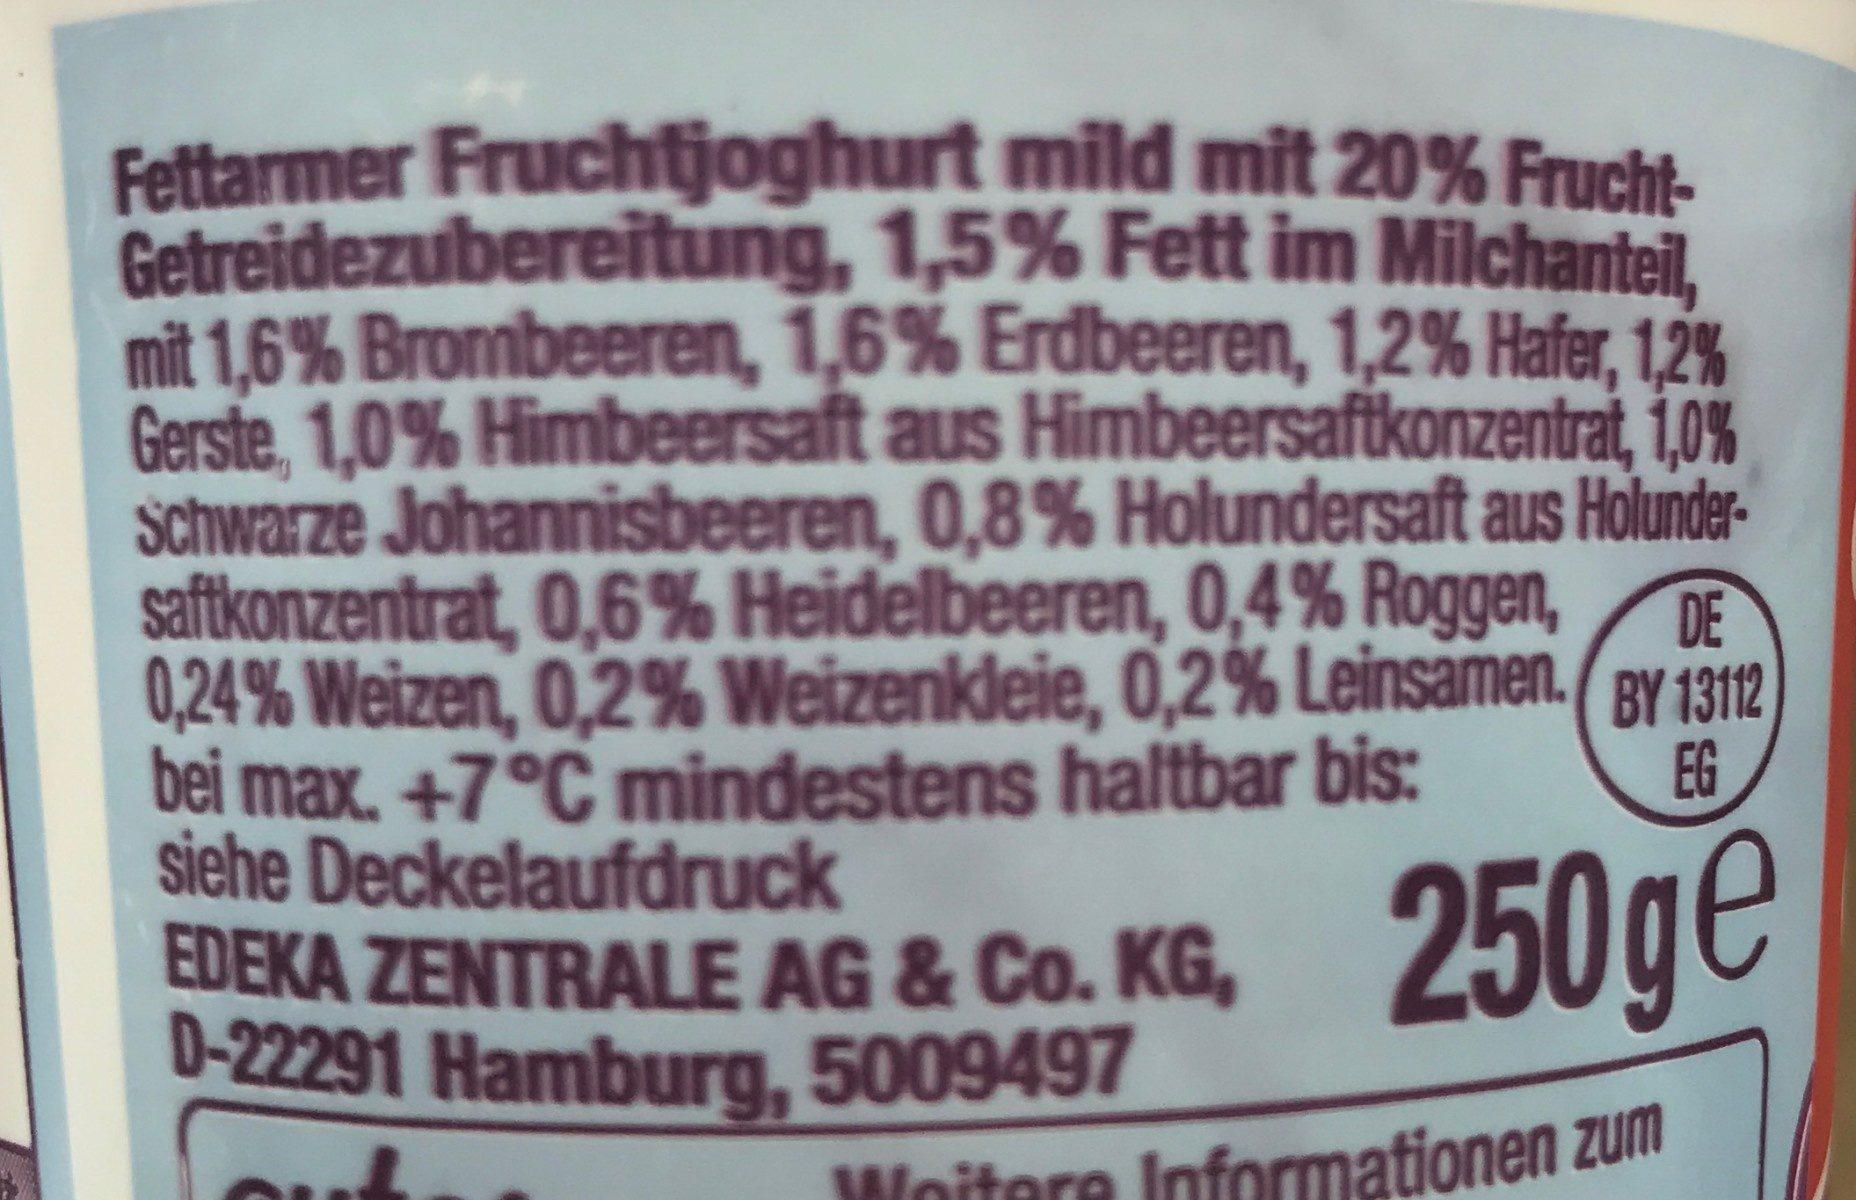 4-Korn Fettarmer Fruchtjoghurt Mild - Ingrédients - fr